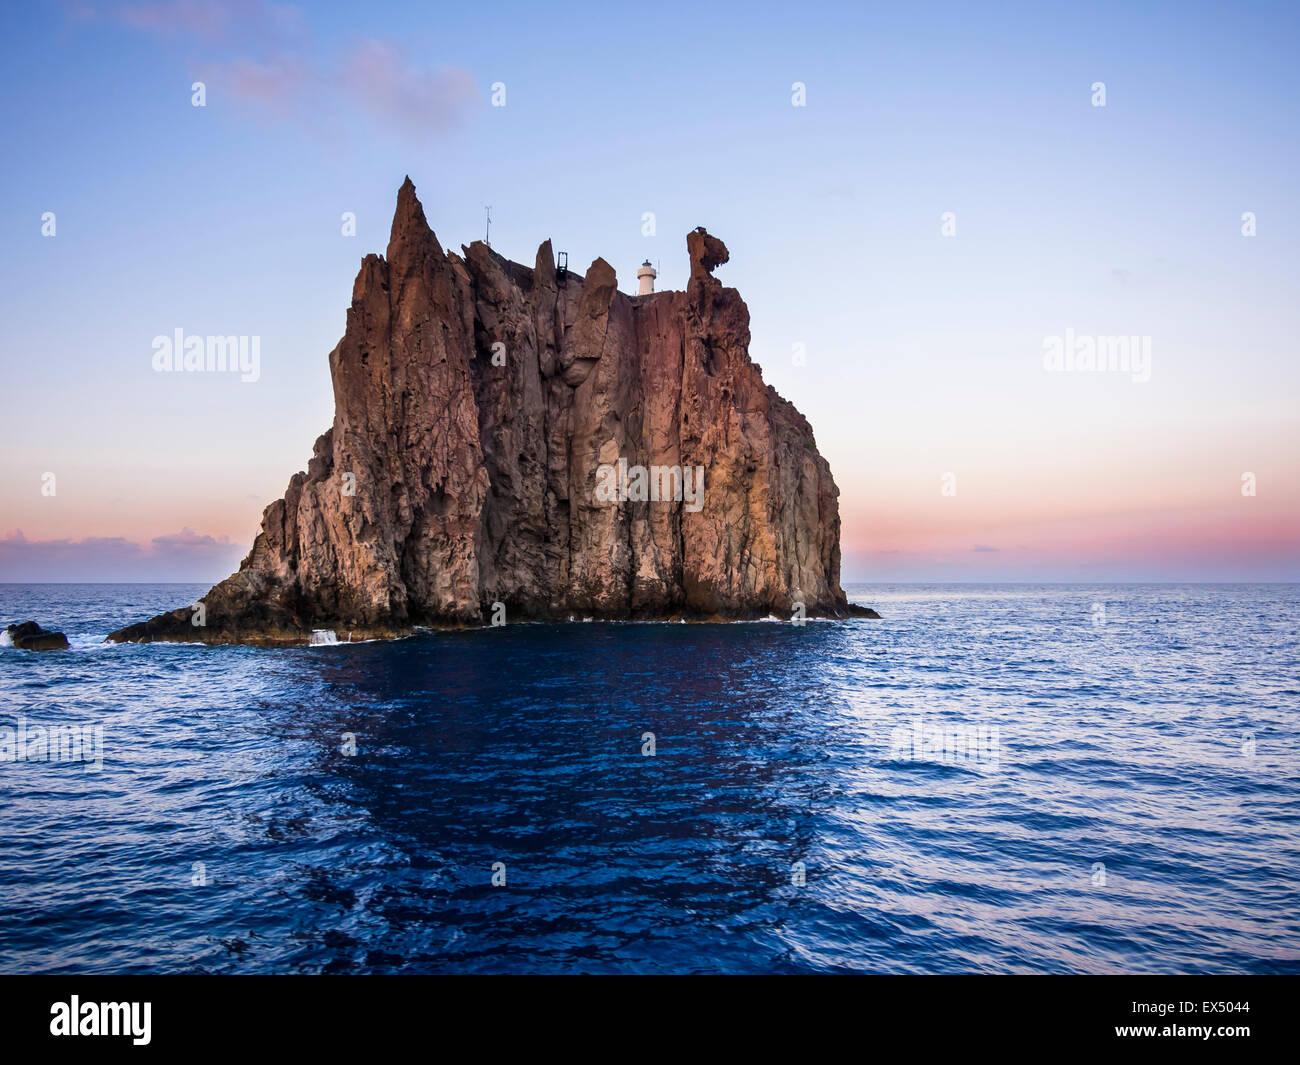 Isola Strombolicchio with lighthouse, Tyrrhenian Sea, Aeolian or Lipari Islands, Sicily, Italy - Stock Image